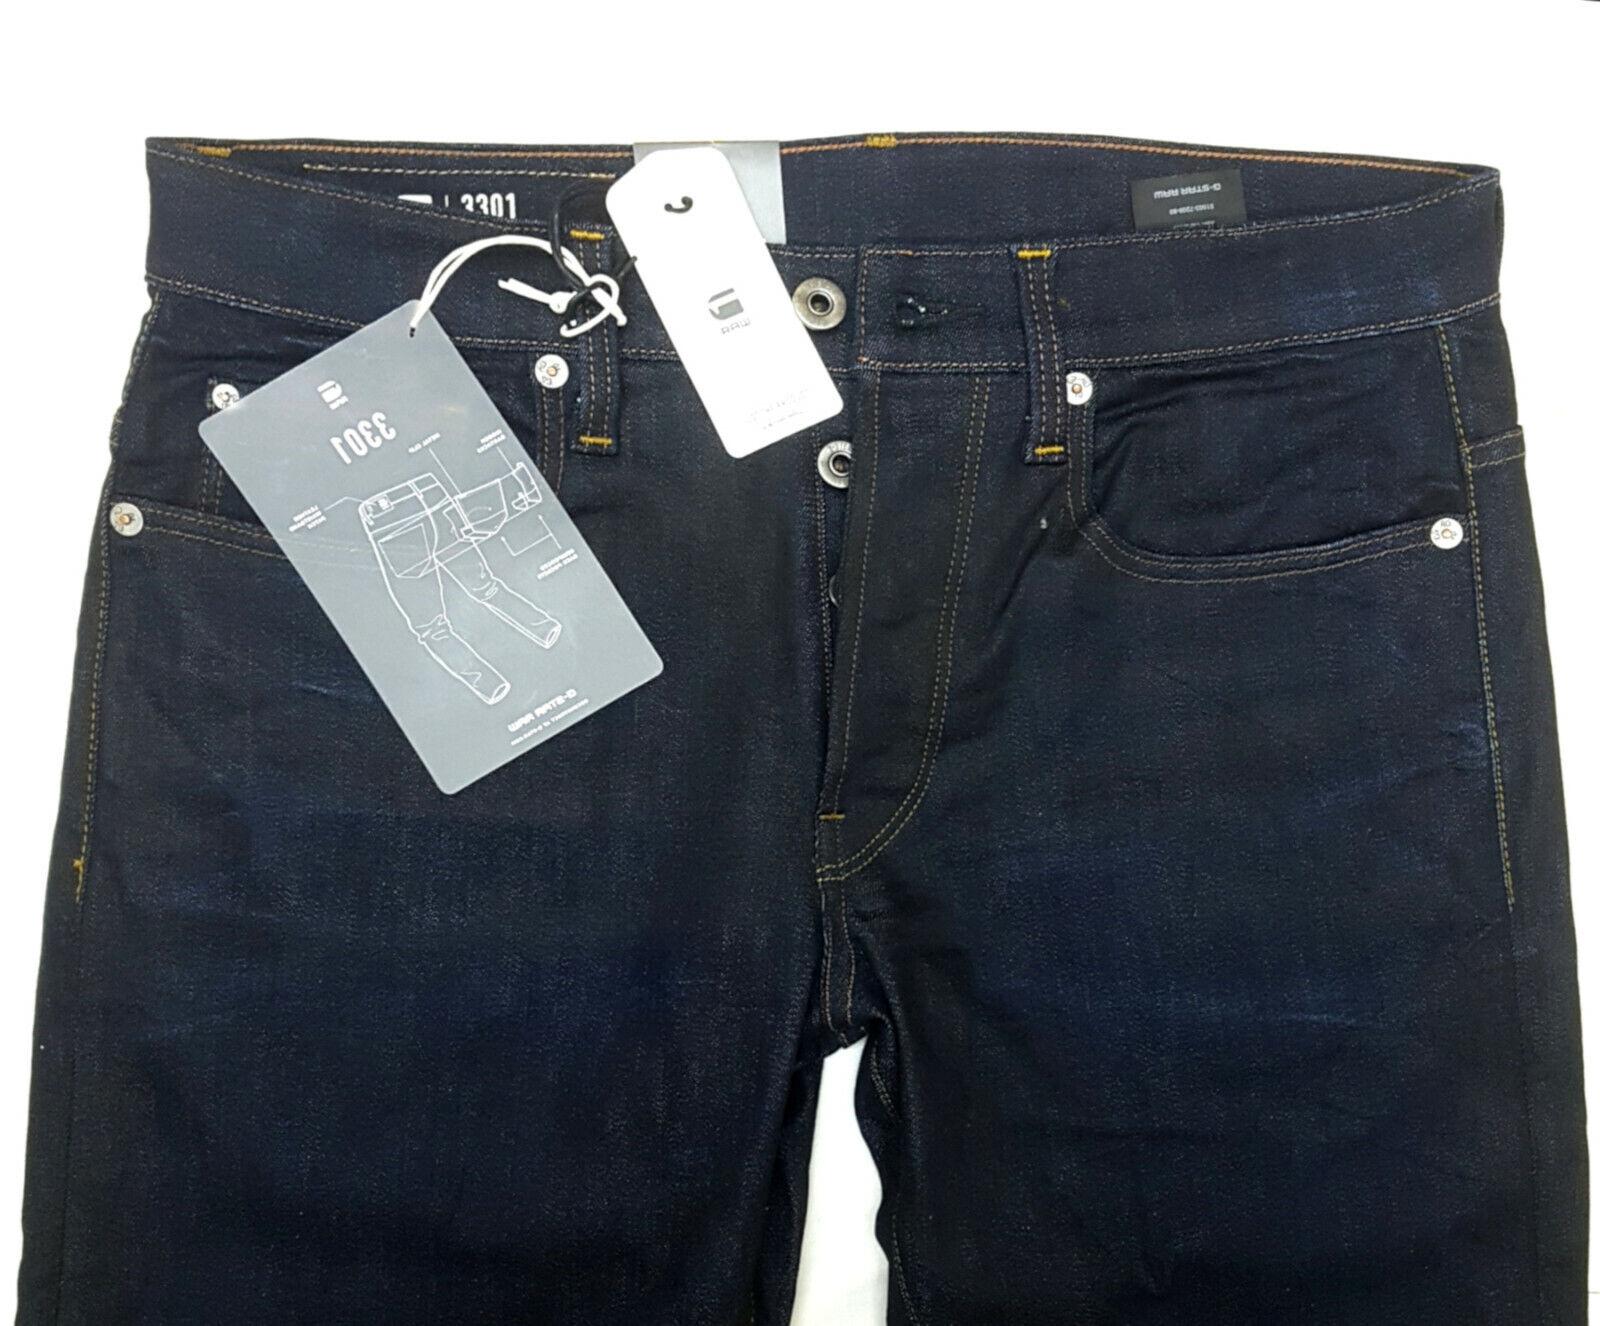 G-Star Herren Jeans Hose 3301 Straight Tapered Fit Dark Aged Black Blue Men NEU